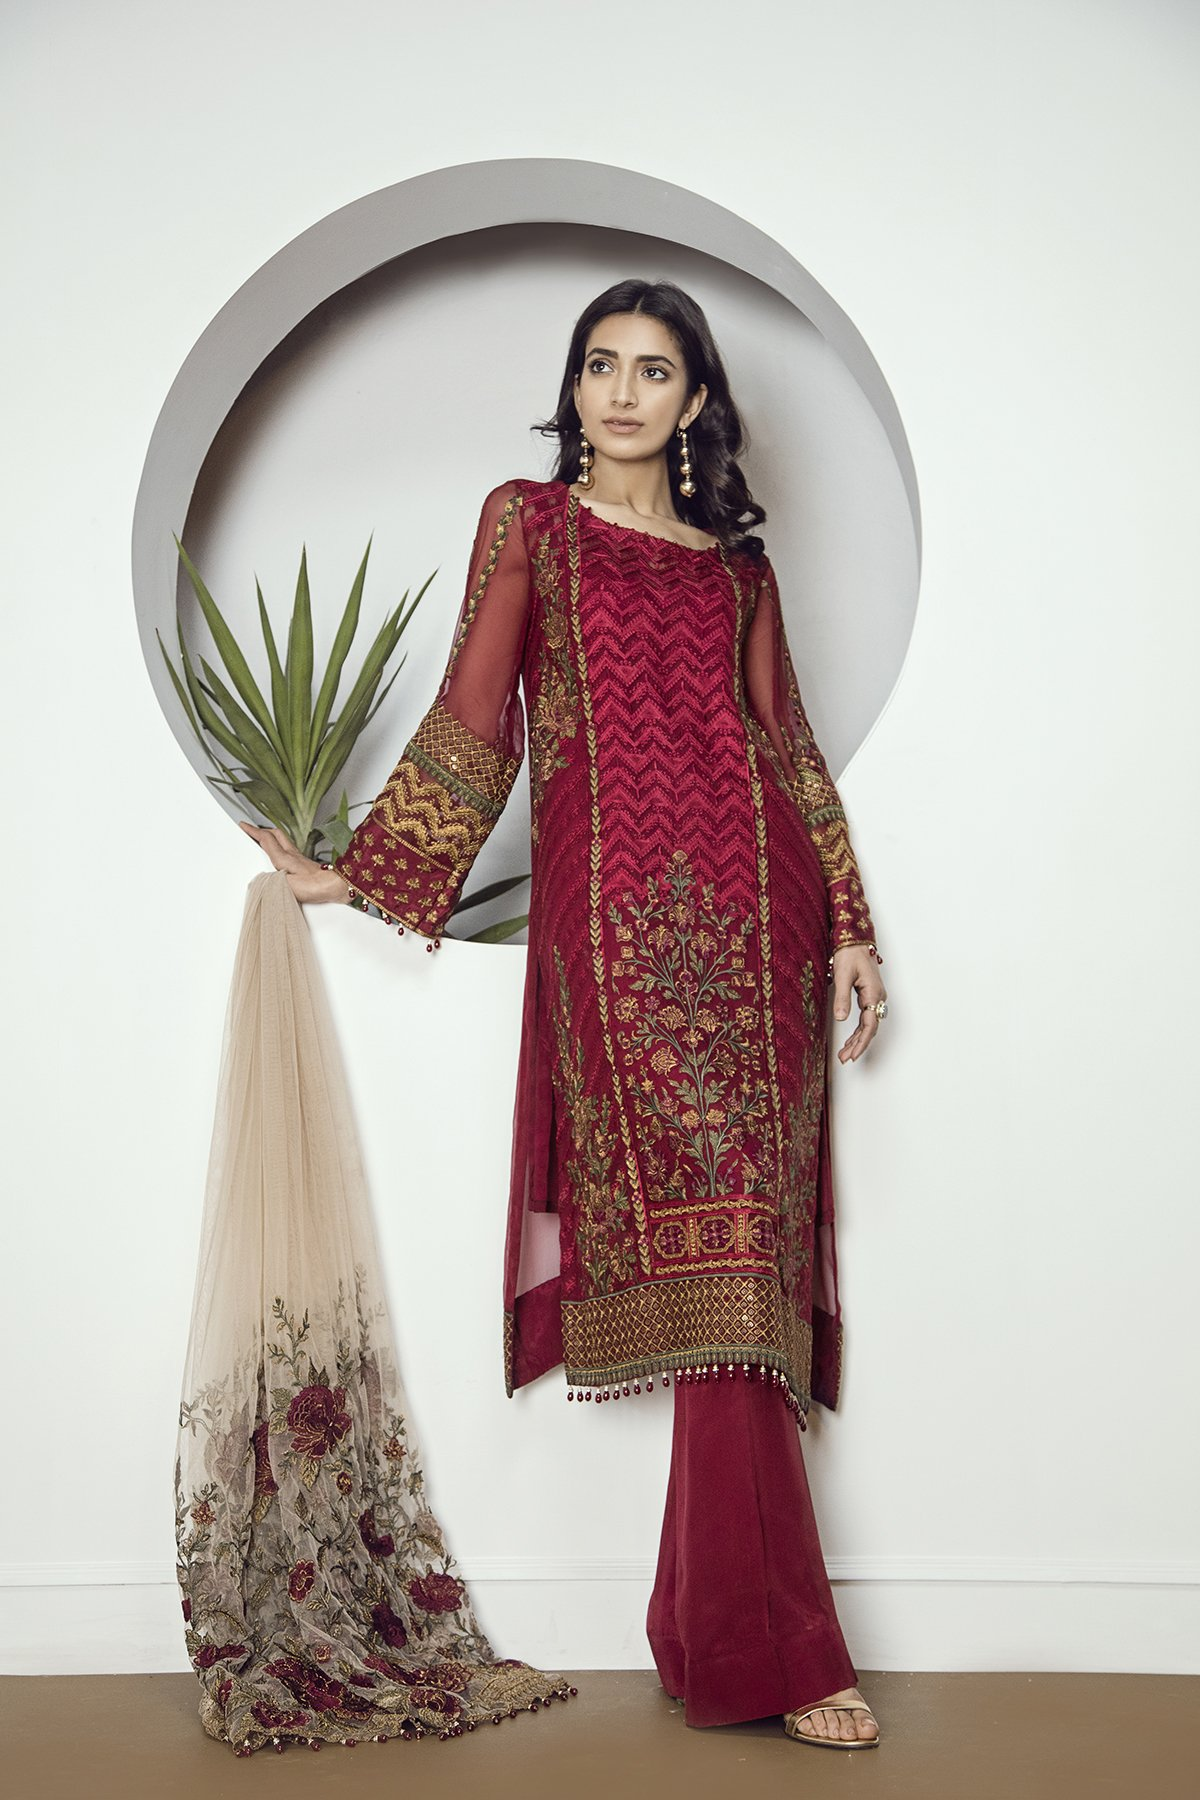 1d44749373 Mint 3 piece dress stitched pret wear by Baroque Chantelle evening wears  2018 - Online Shopping in Pakistan